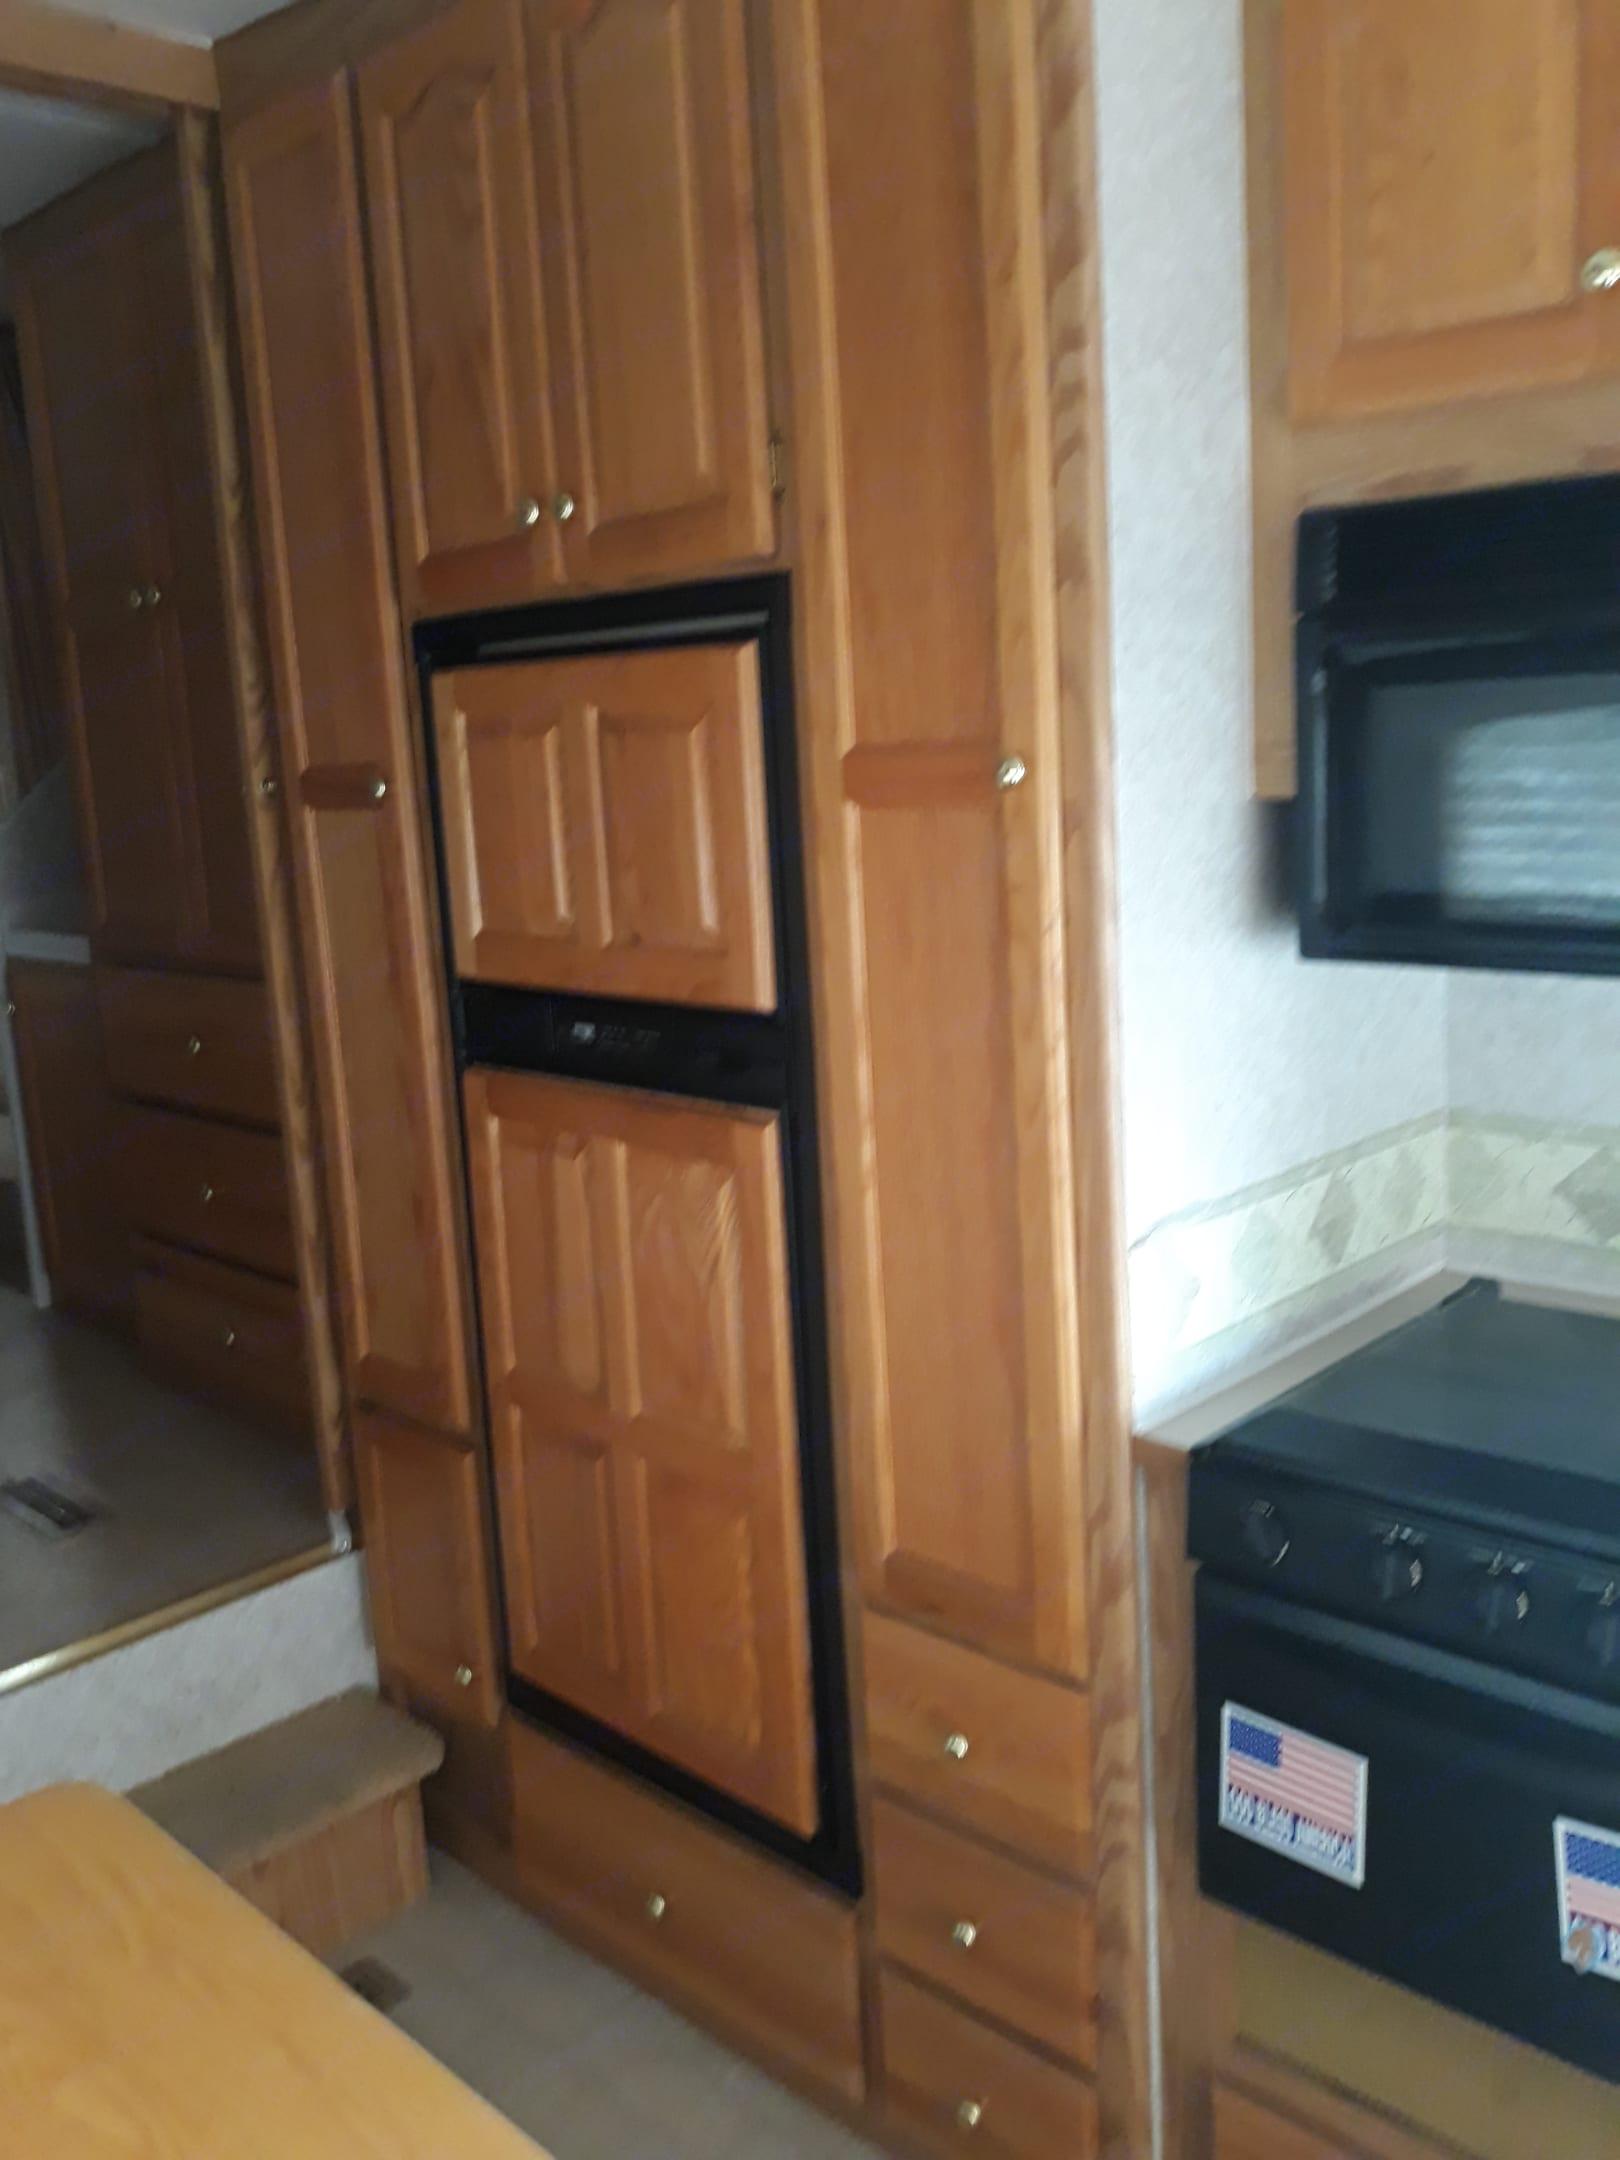 Fridge, freezer and storage . Ameri-Camp 290rls 2004